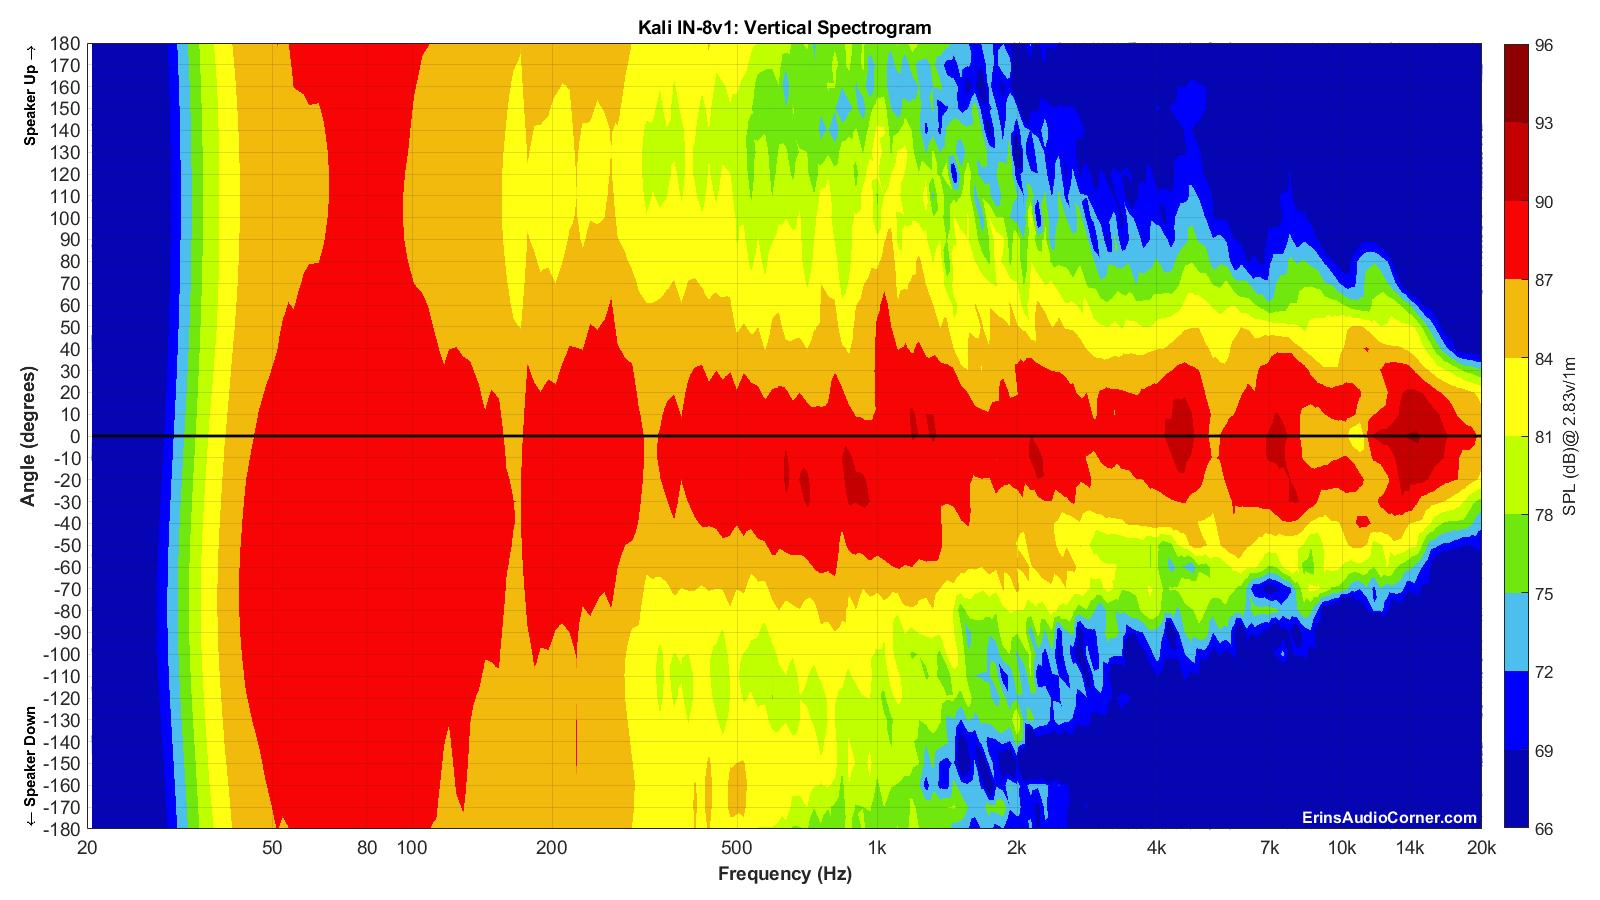 Kali%20IN-8v1_Vertical_Spectrogram_Full.png